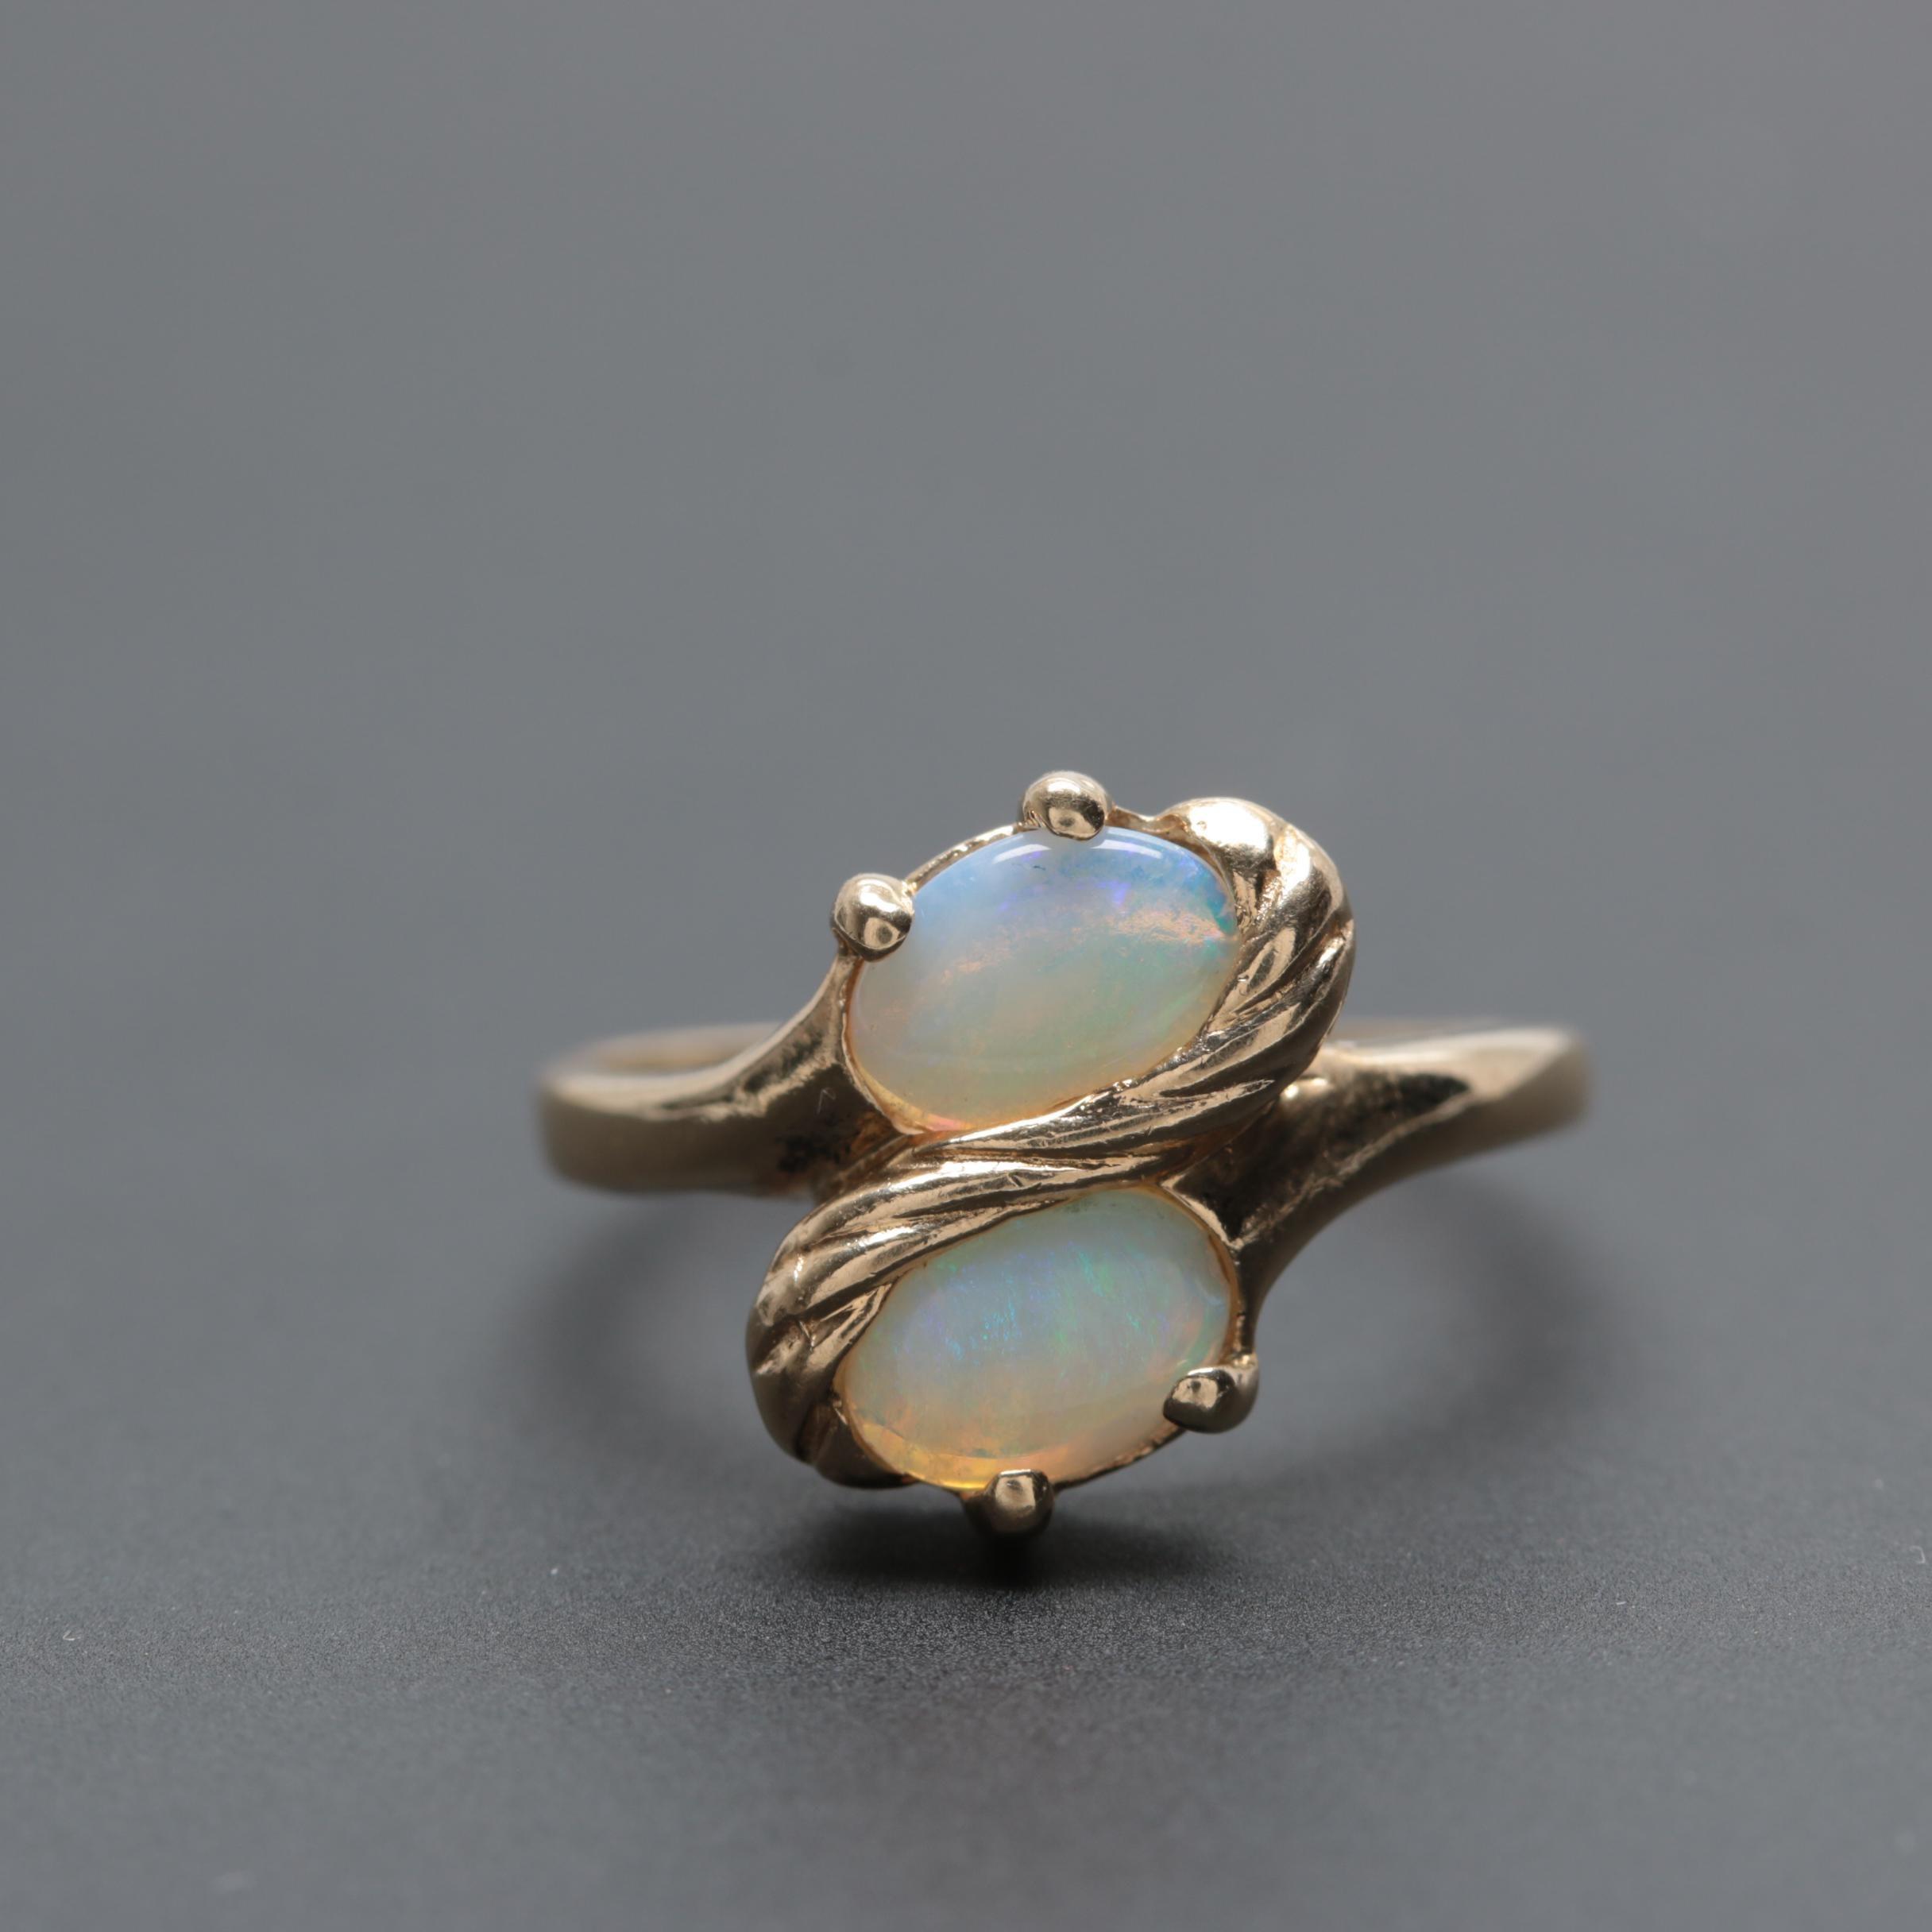 14K Yellow Gold Opal Bypass Ring